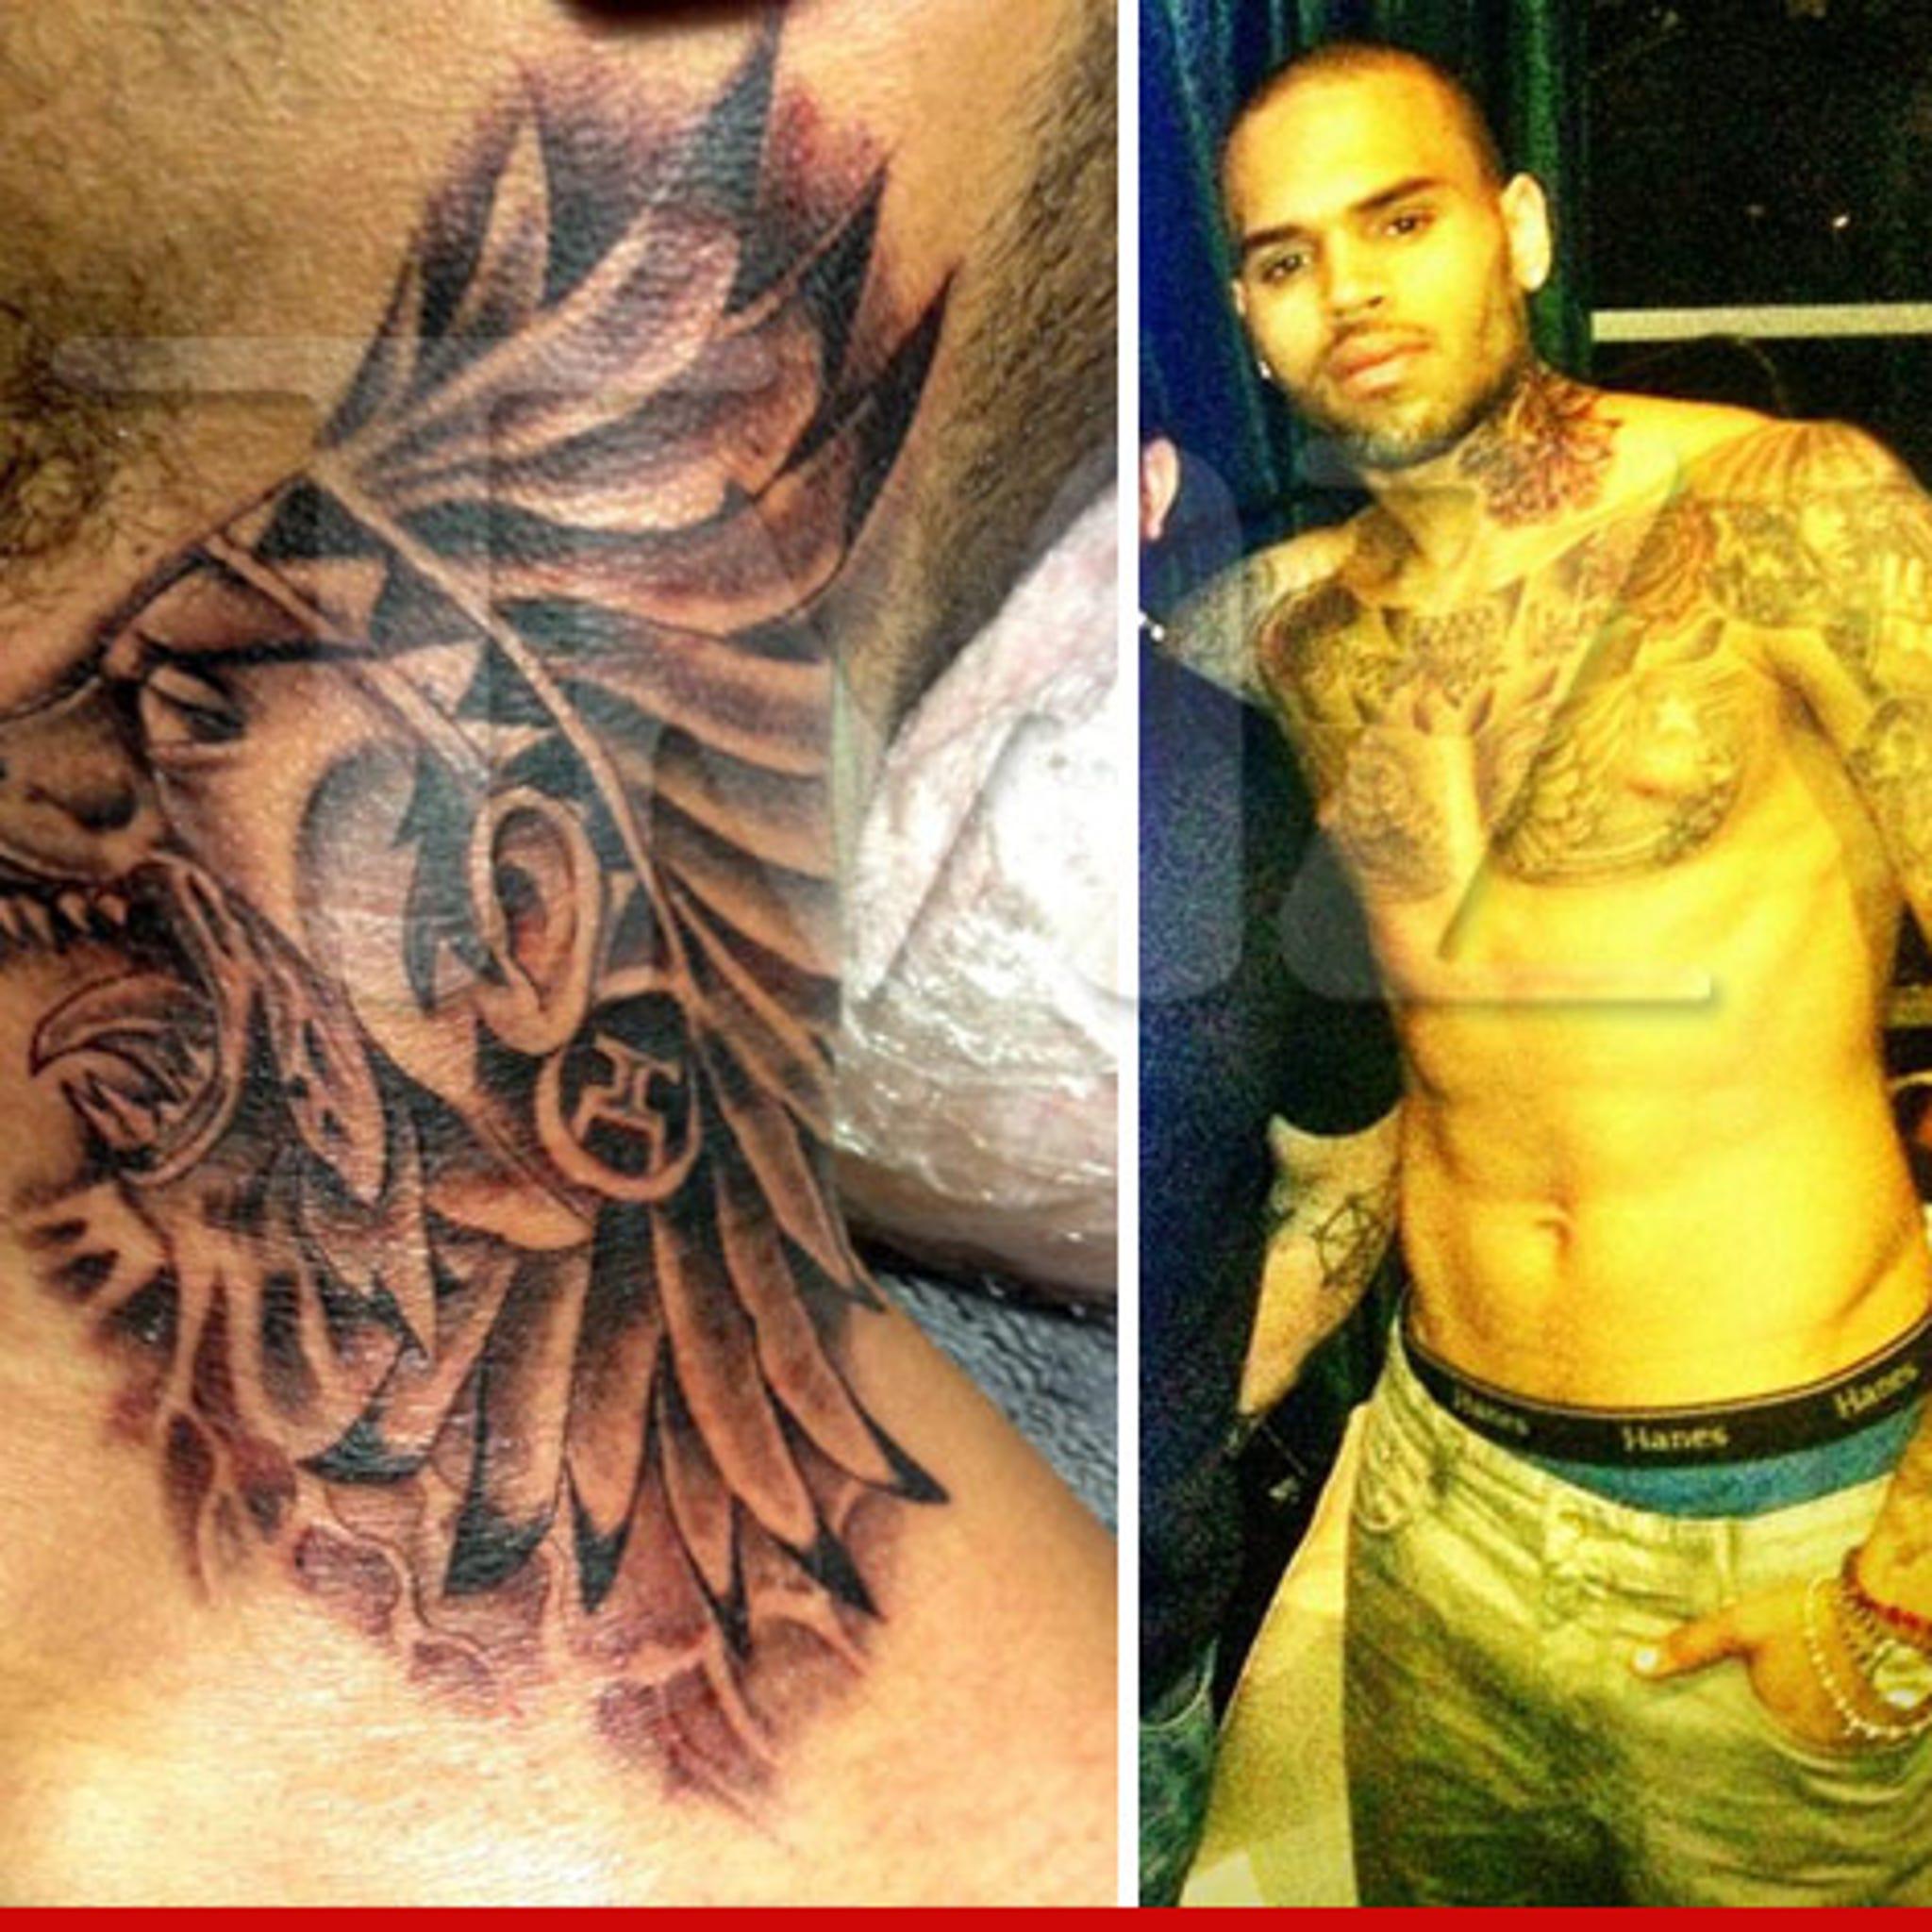 Chris Brown New Neck Tattoo Photos